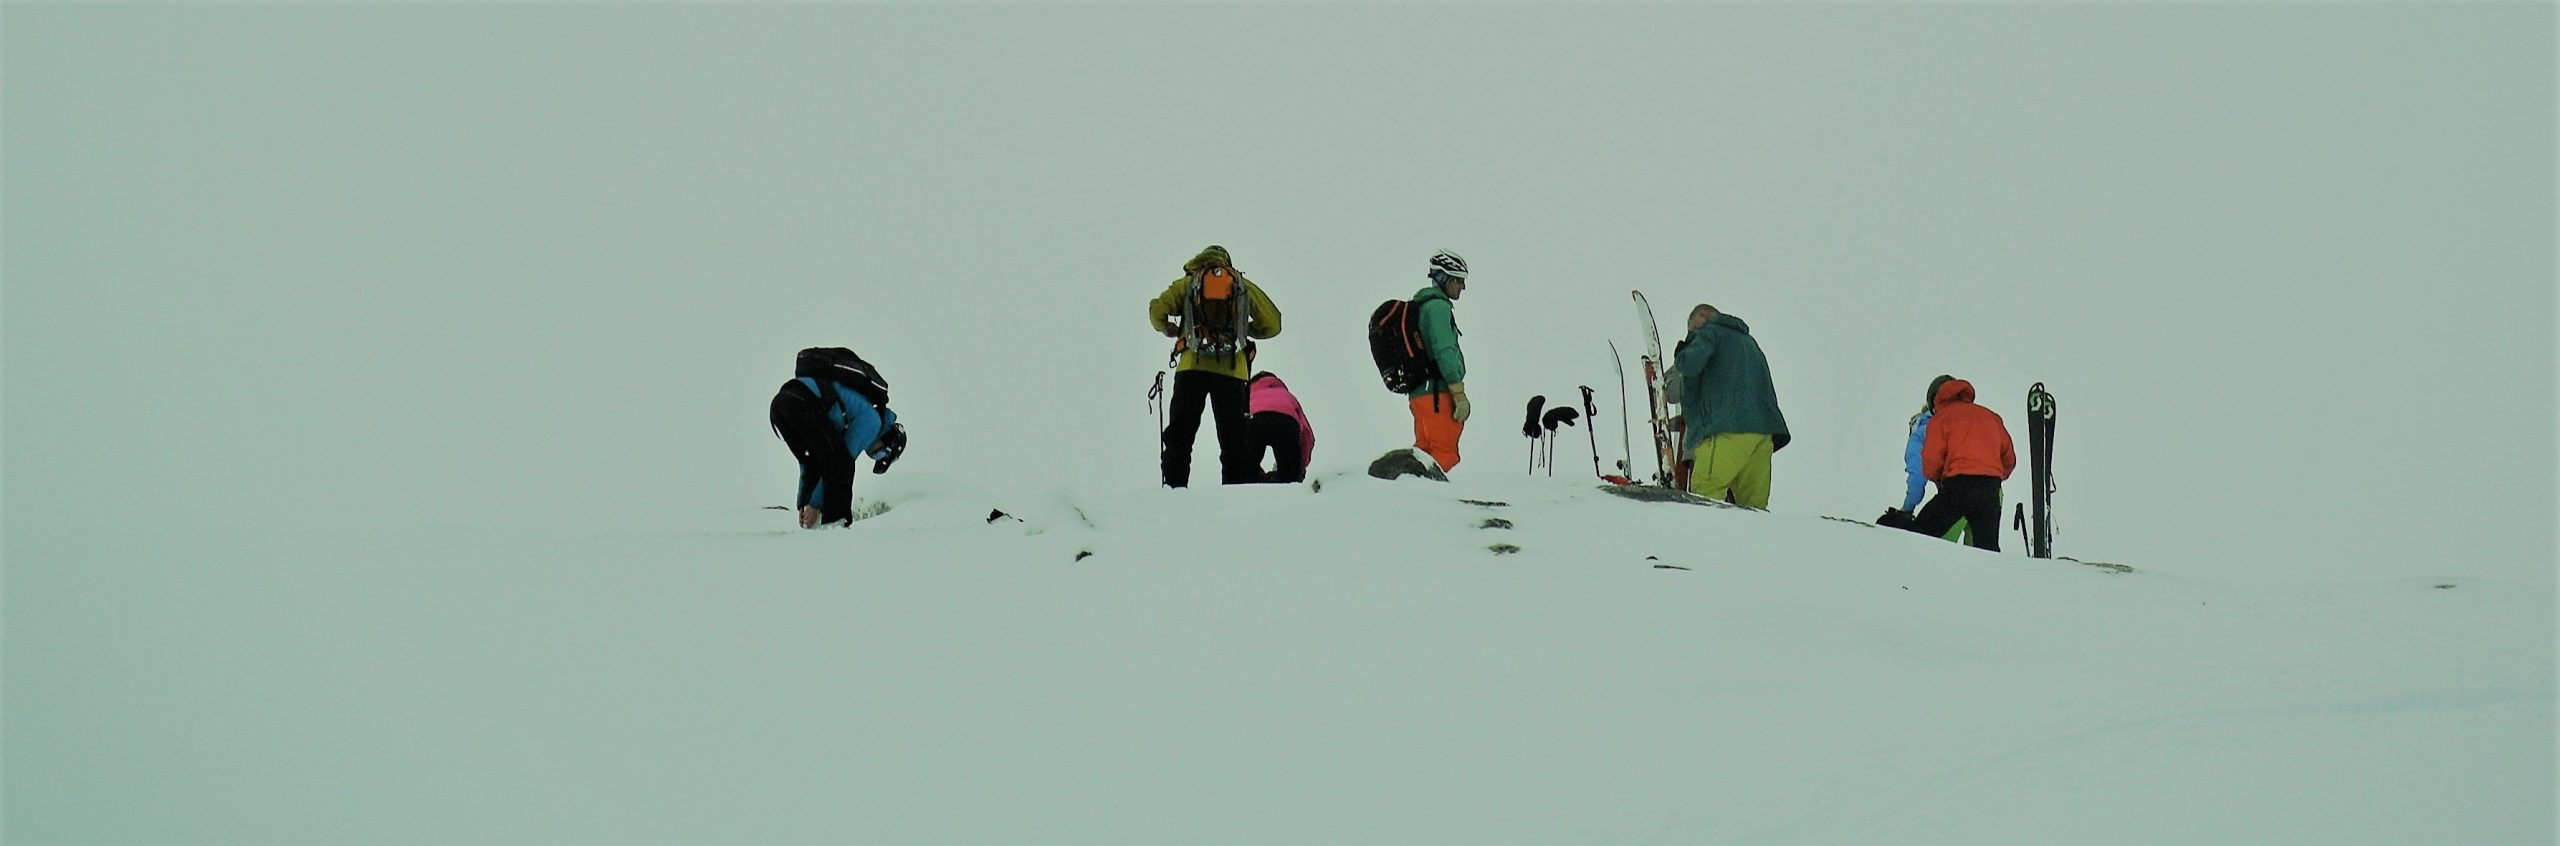 Ski Touring | Norway